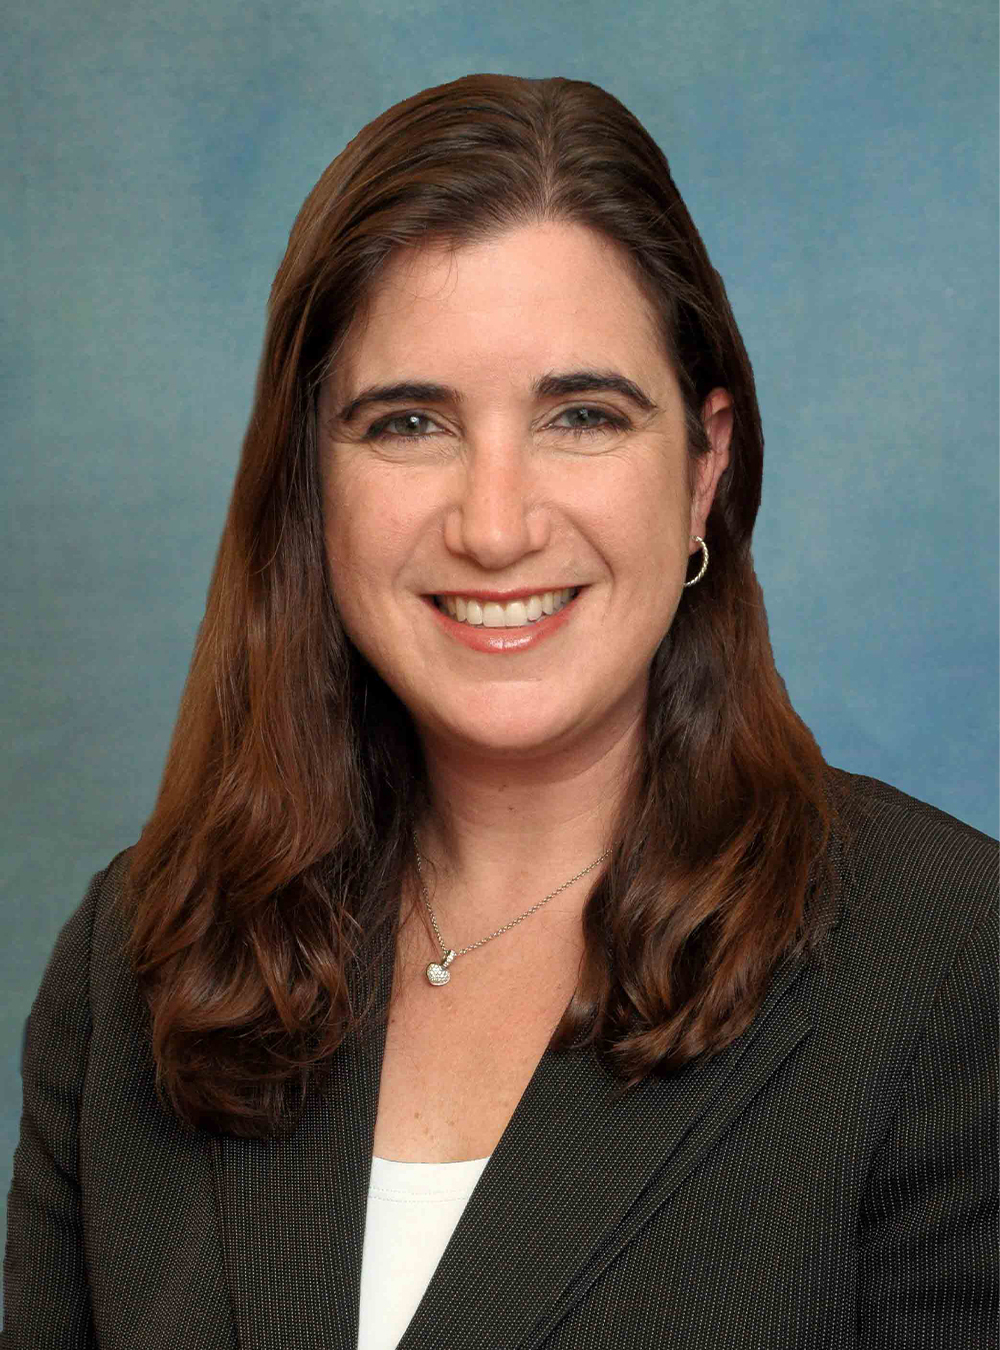 Portrait of Marci A. Rosenthal